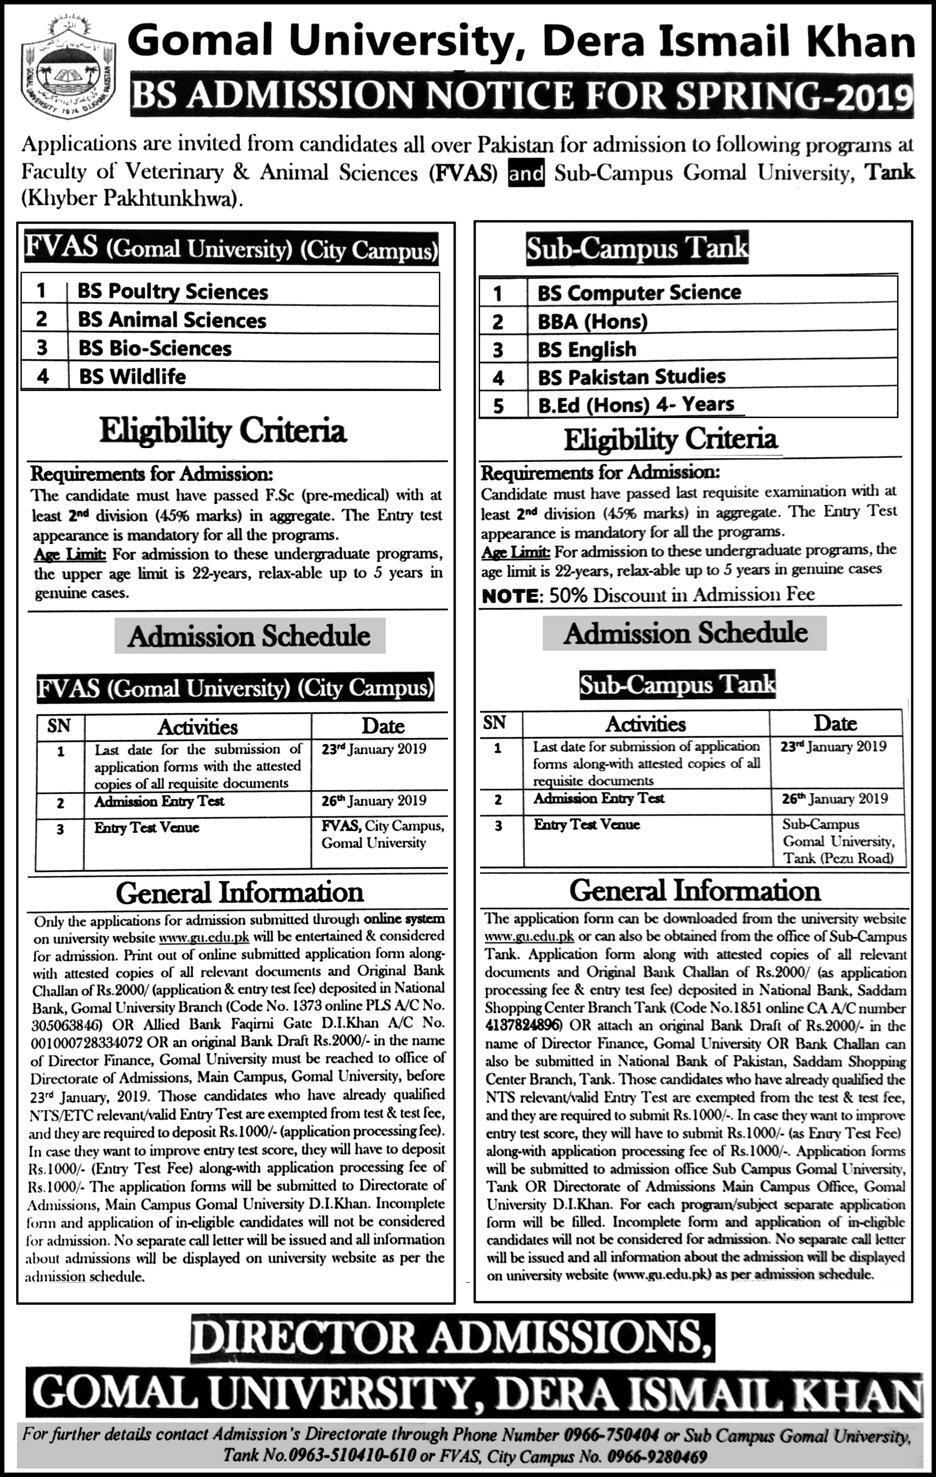 Gomal University Di Khan Admission 2019 Form Last Date